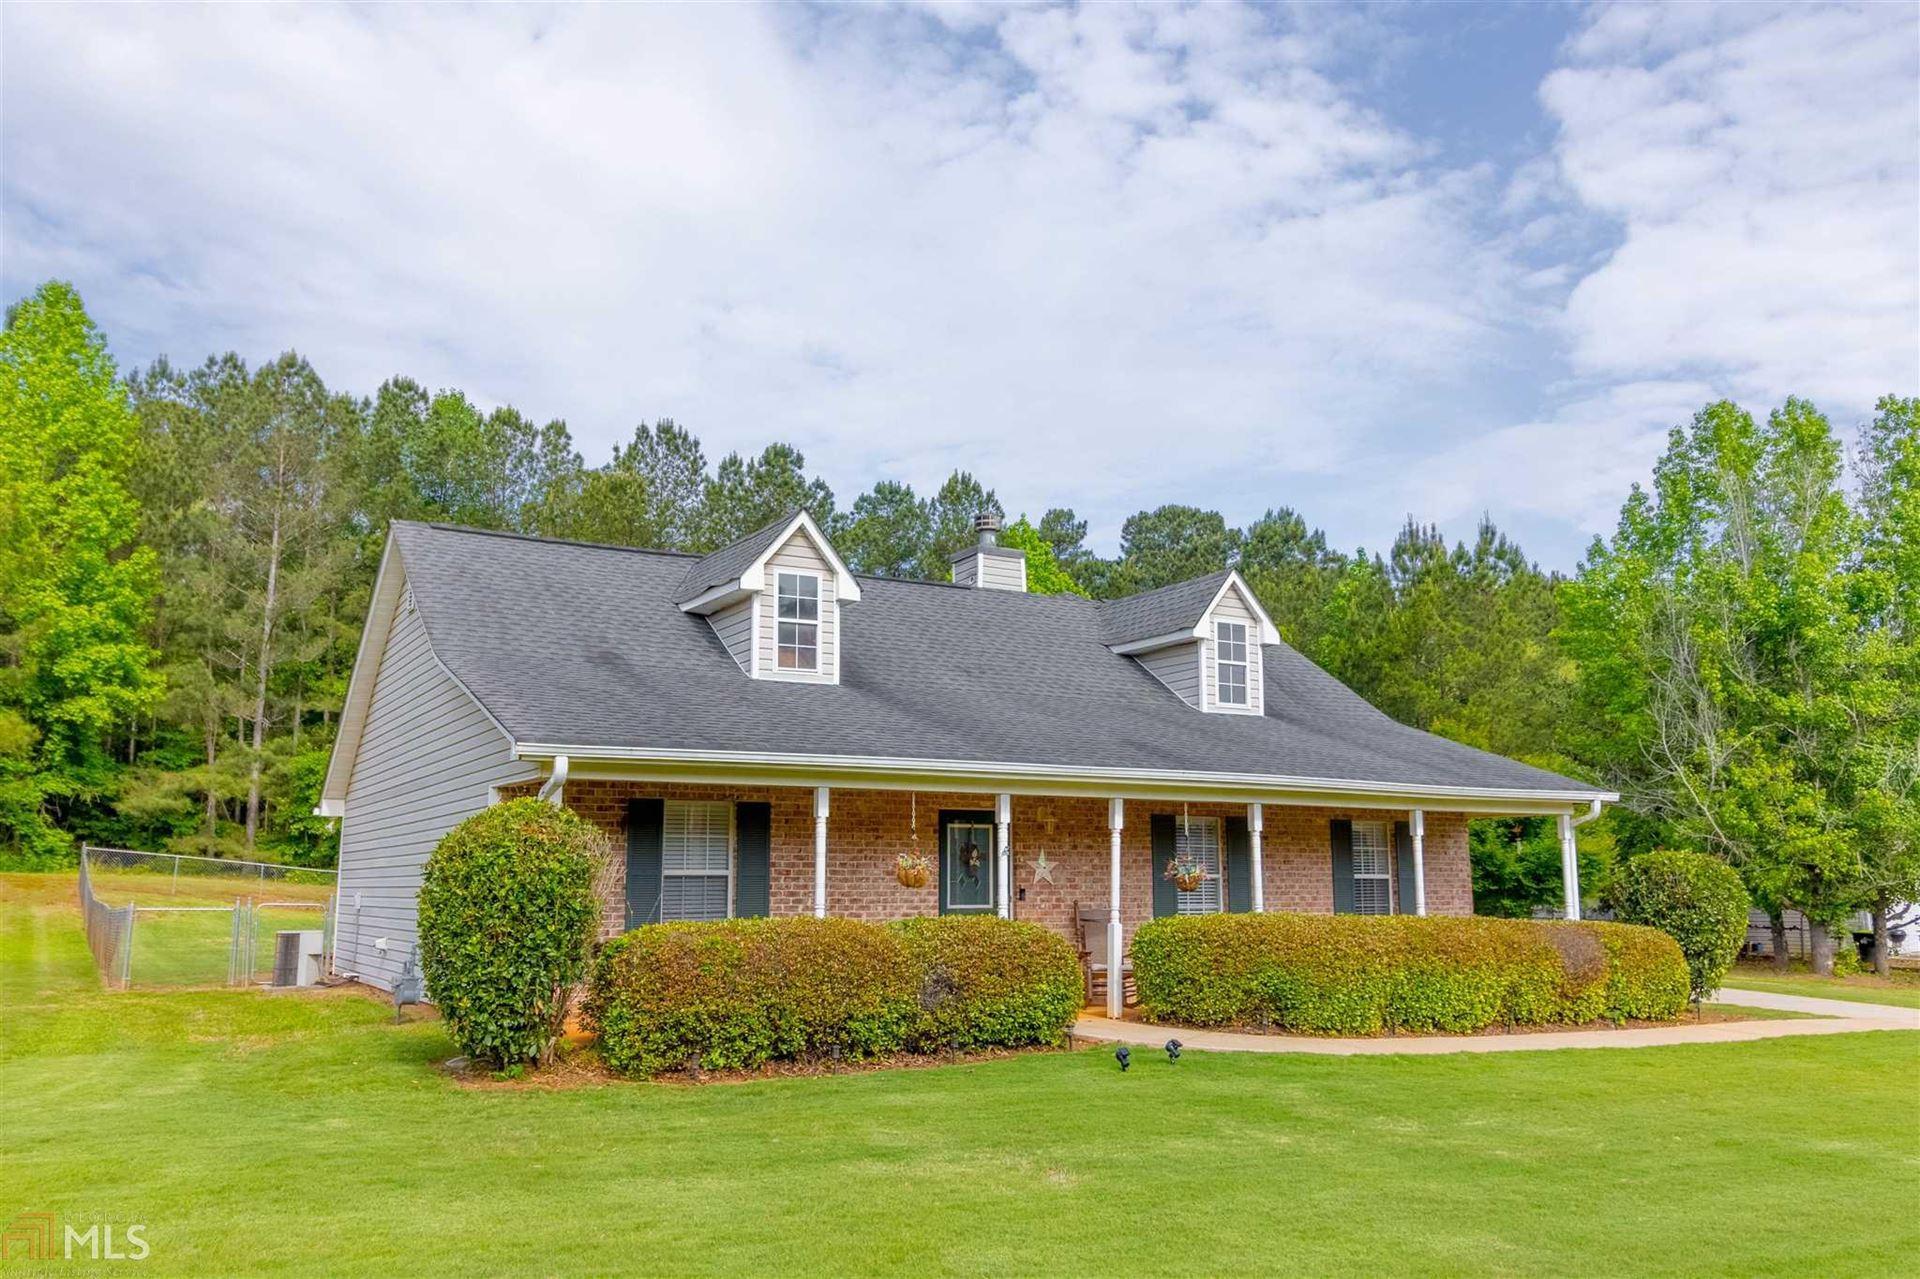 Photo of 109 New Farm Dr, Locust Grove, GA 30248 (MLS # 8975580)